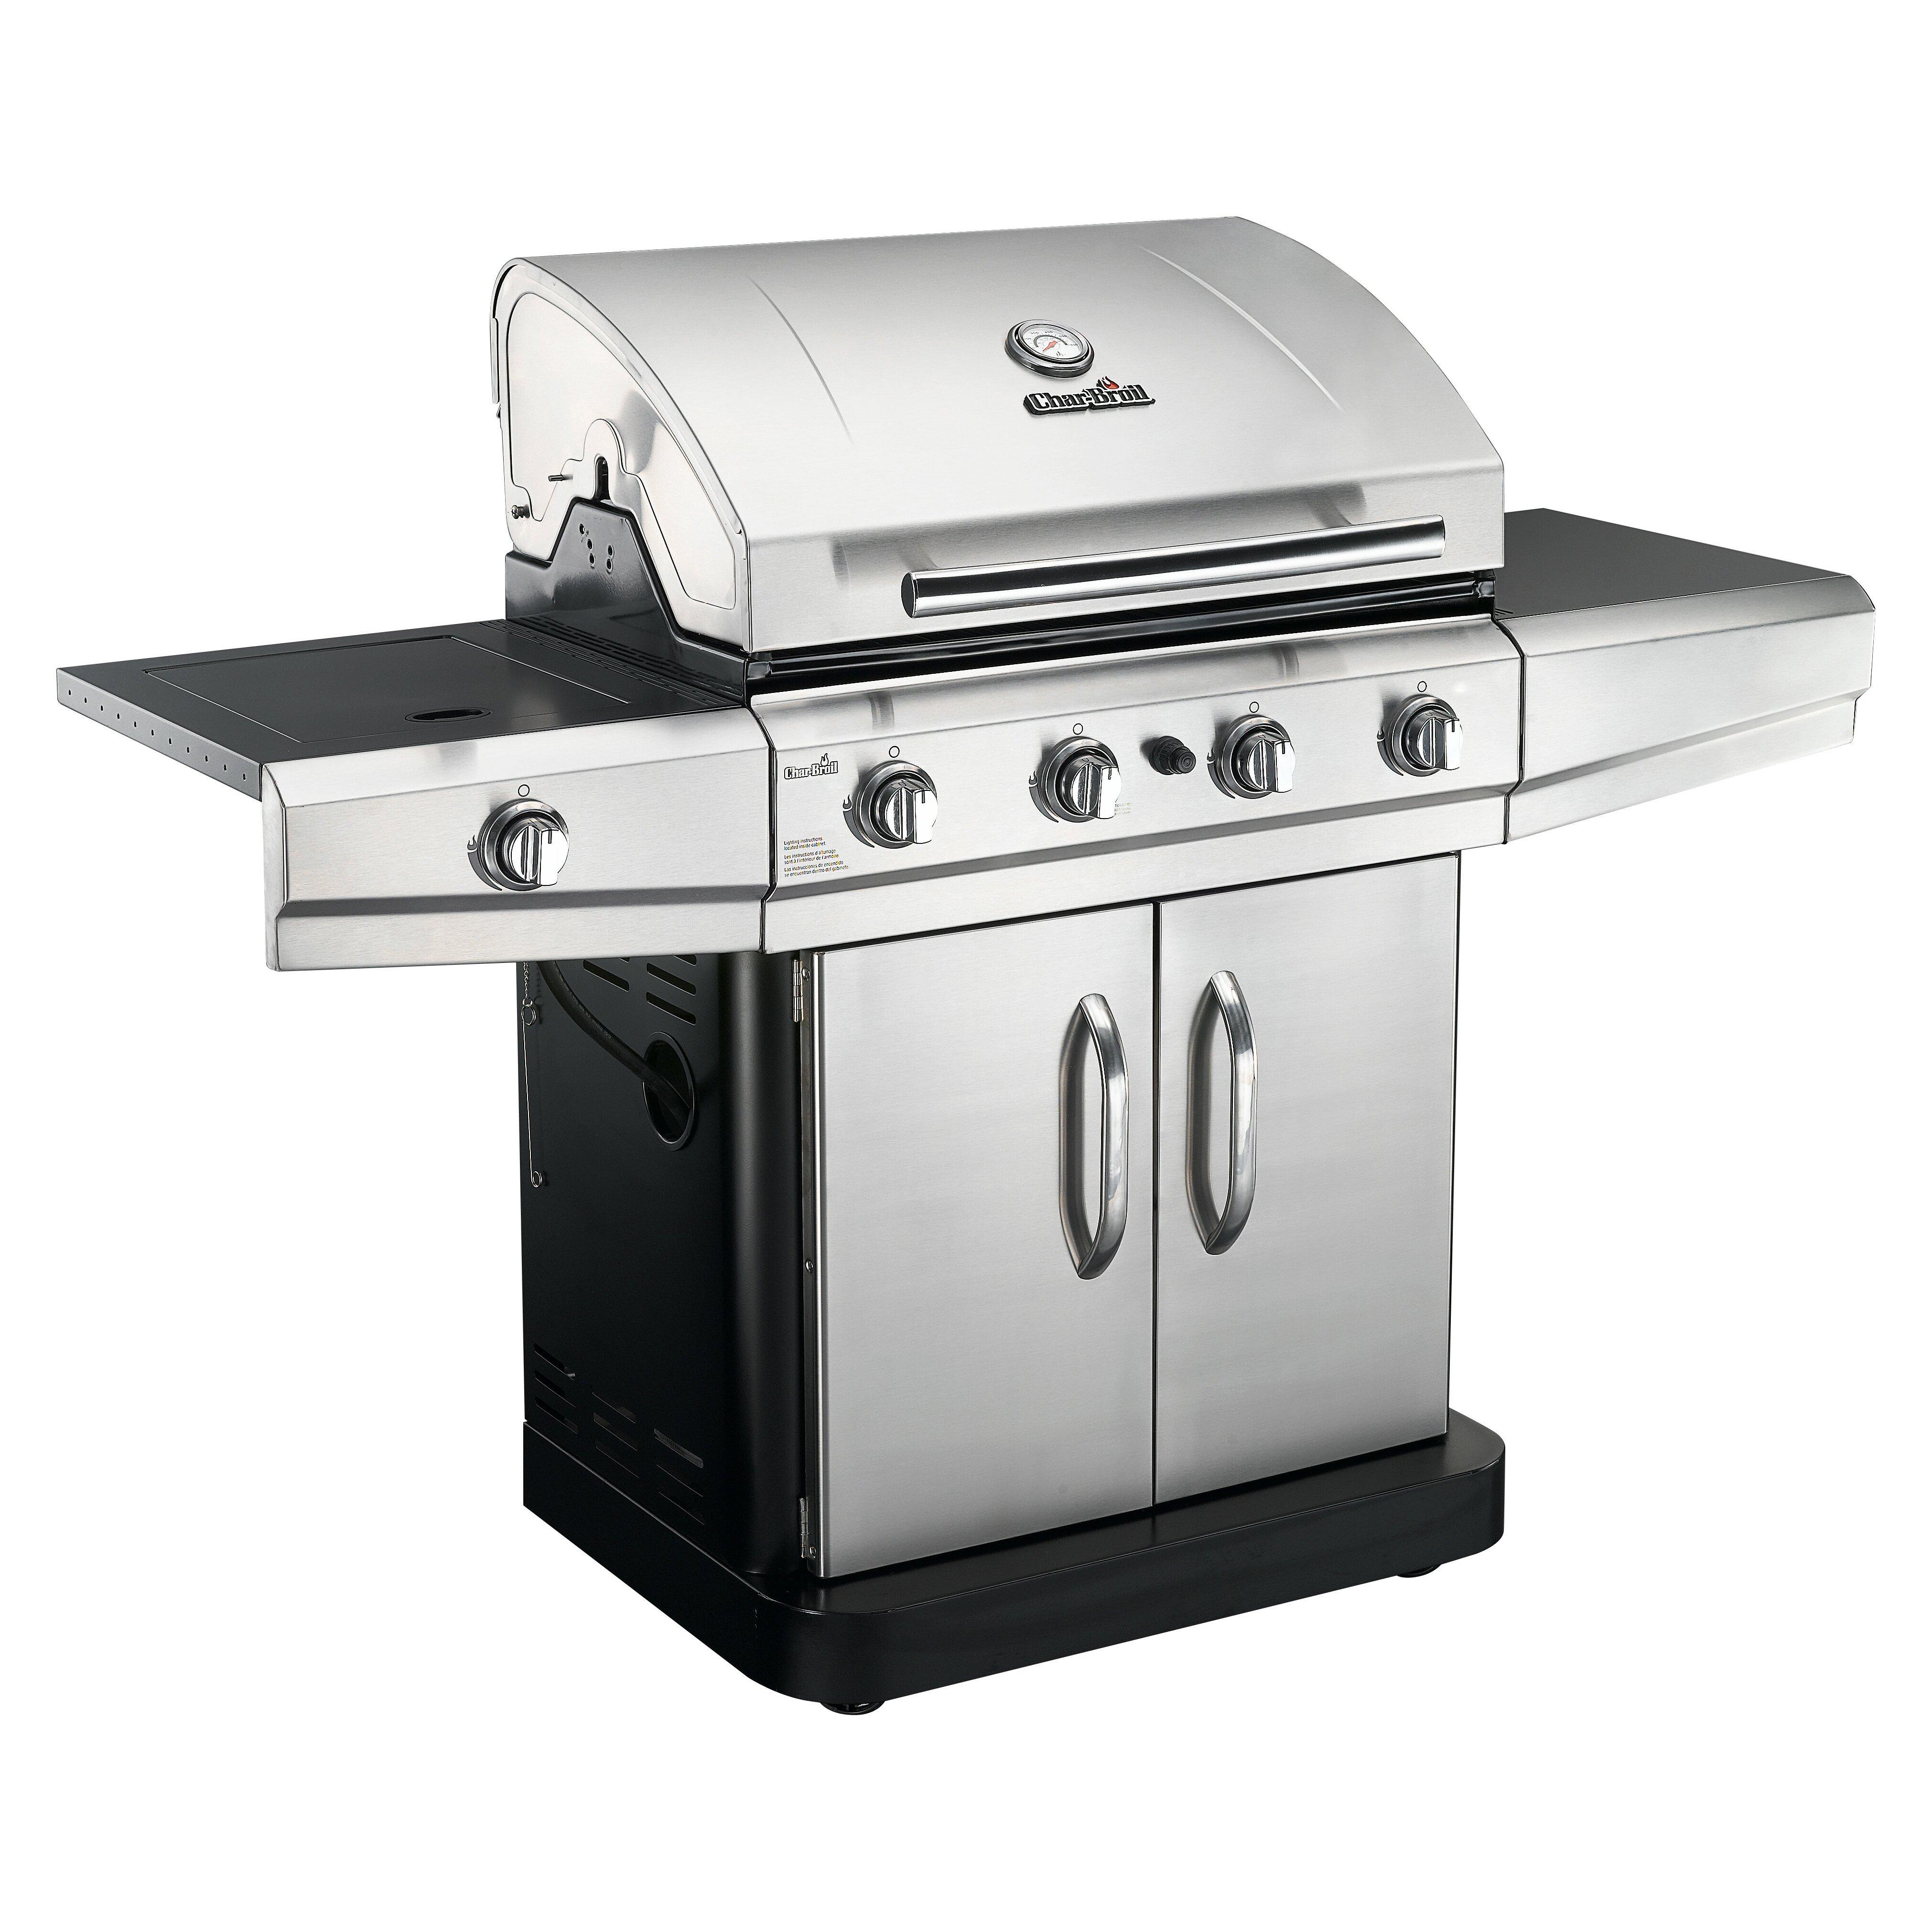 charbroil classic 4 burner gas grill with side burner reviews wayfair. Black Bedroom Furniture Sets. Home Design Ideas